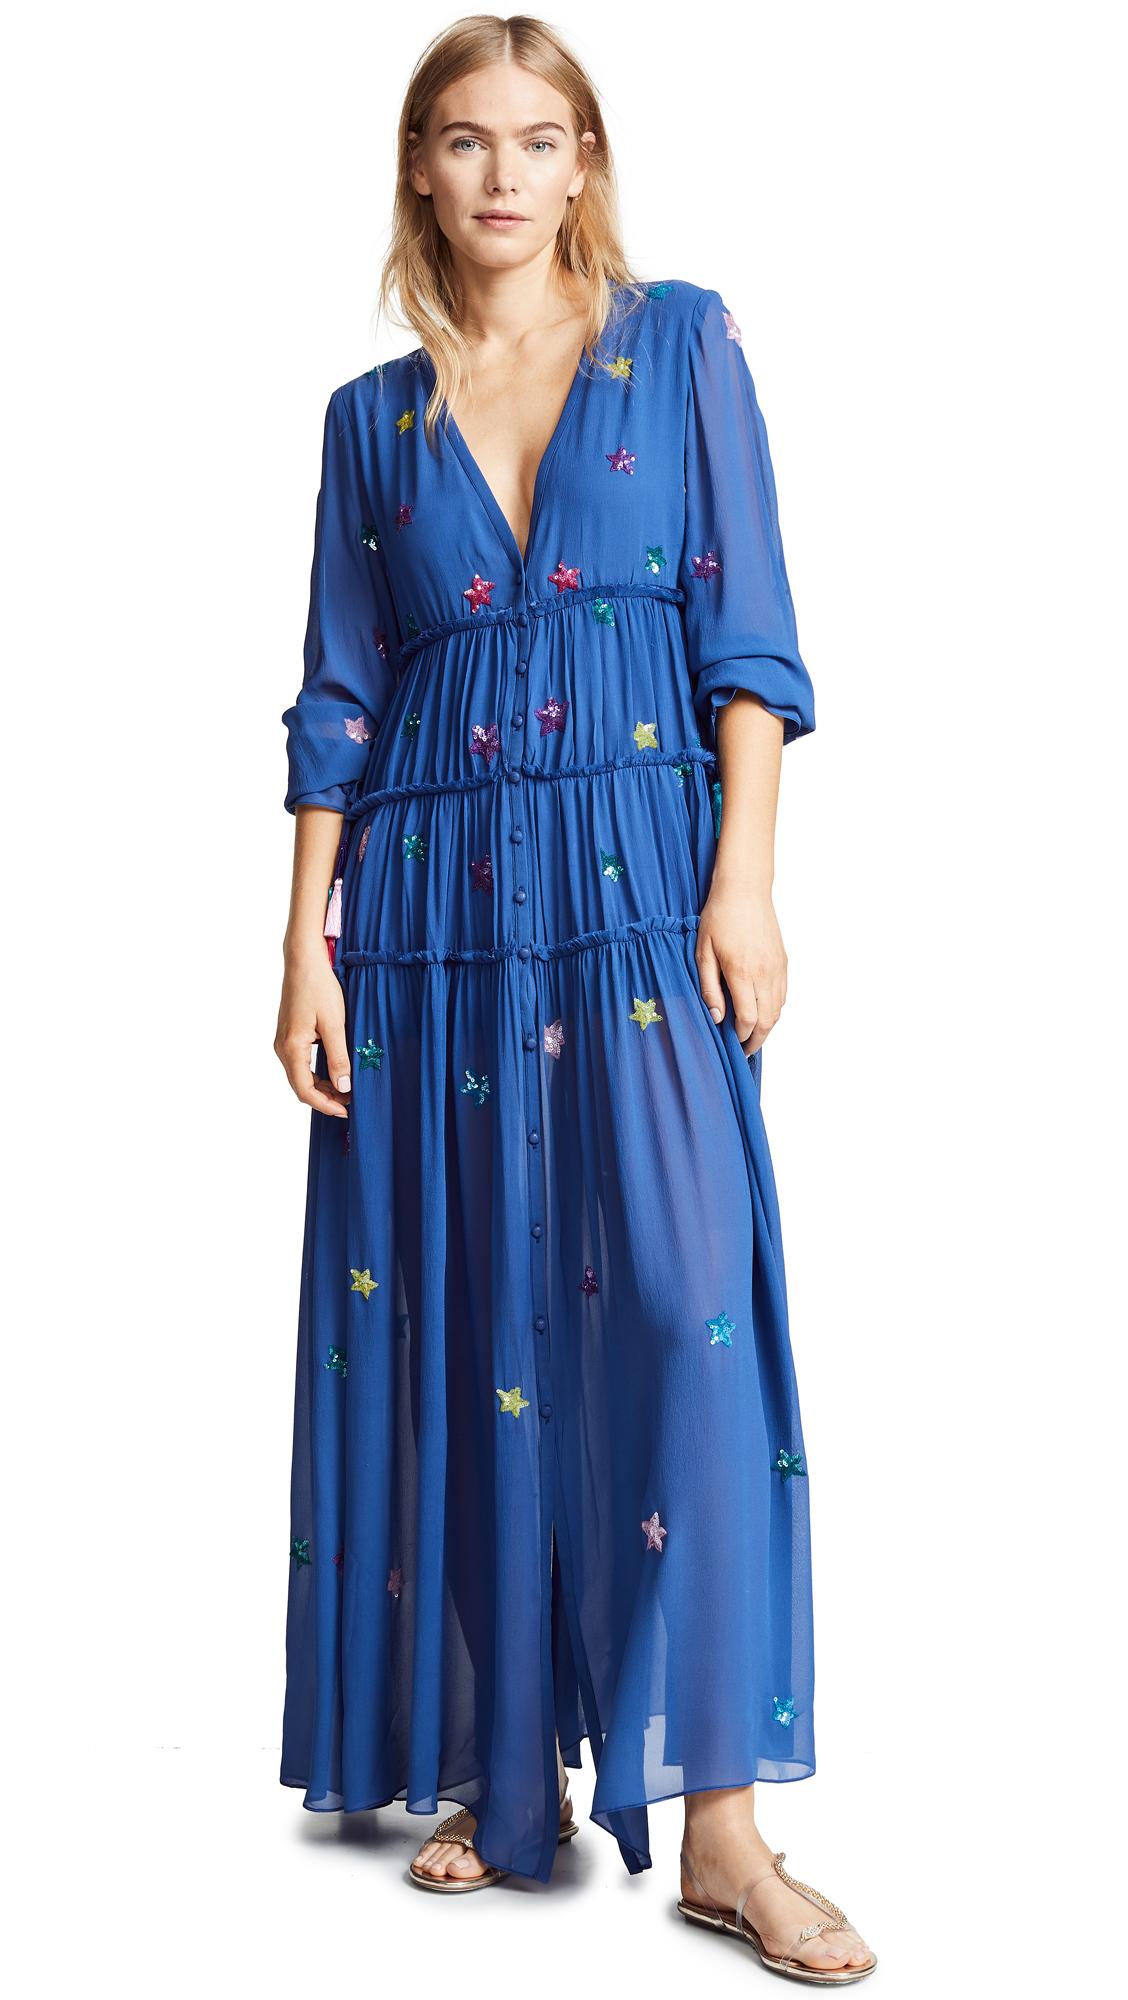 ROCOCO SAND Stellar Long Dress in Navy